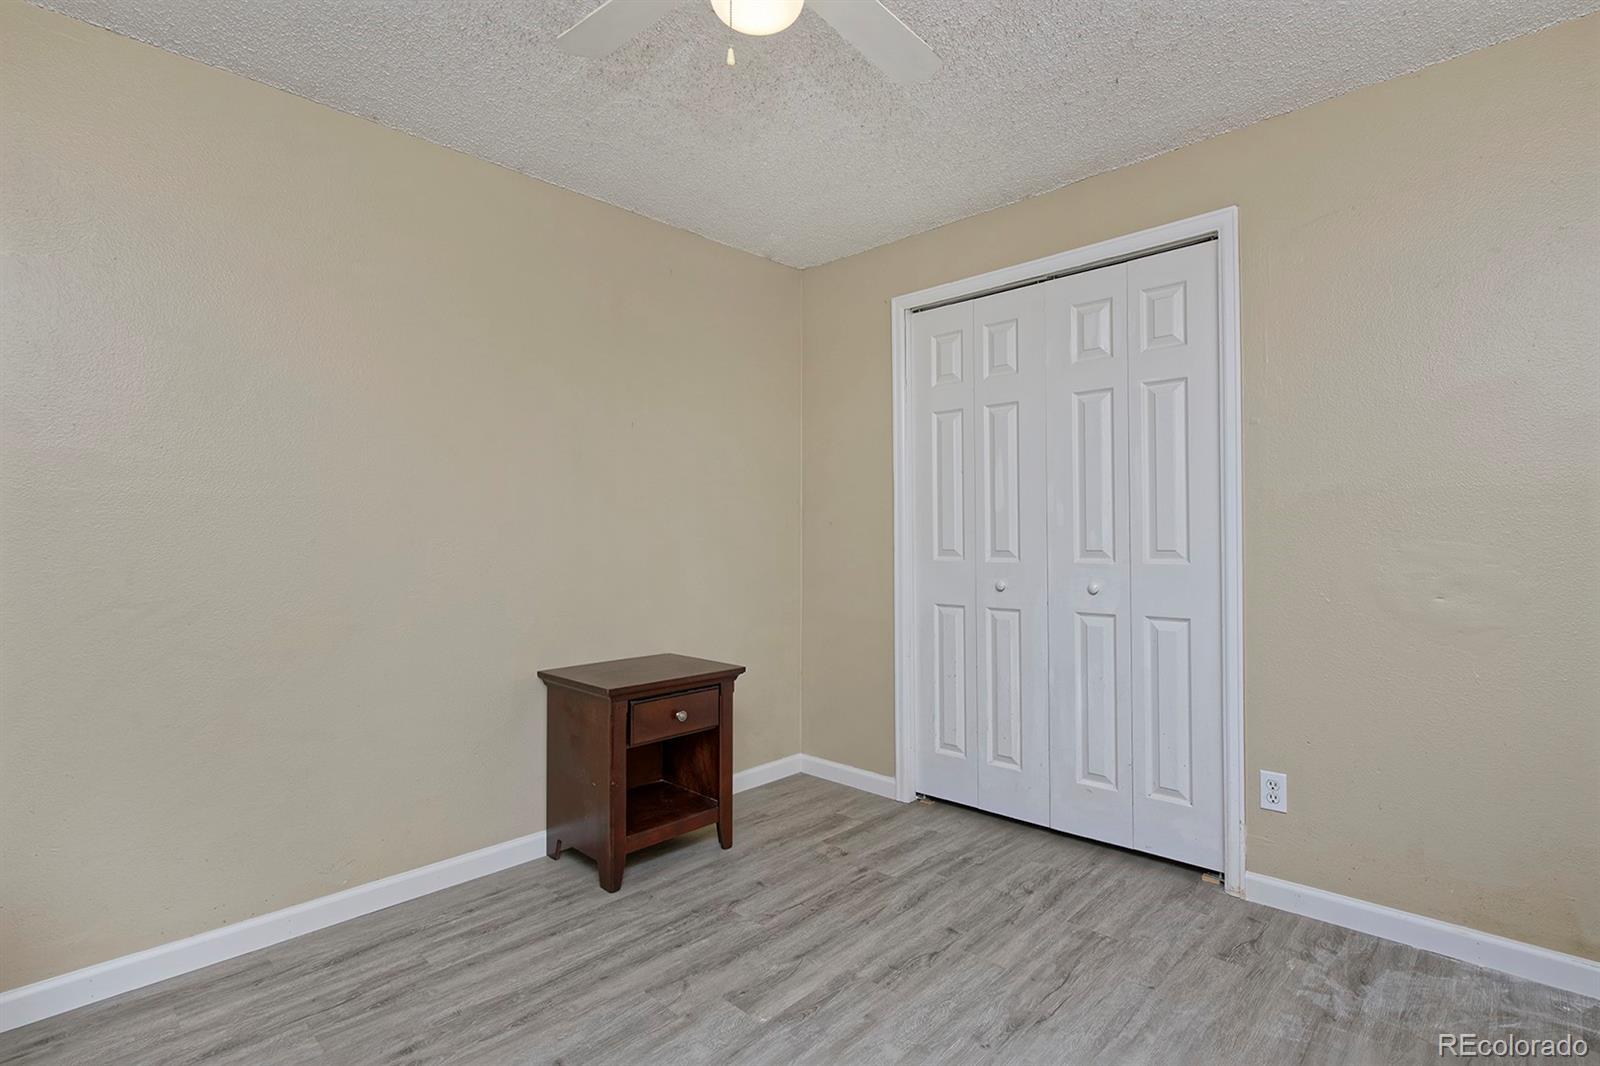 MLS# 4527585 - 14 - 13276 Callisto Drive, Littleton, CO 80124